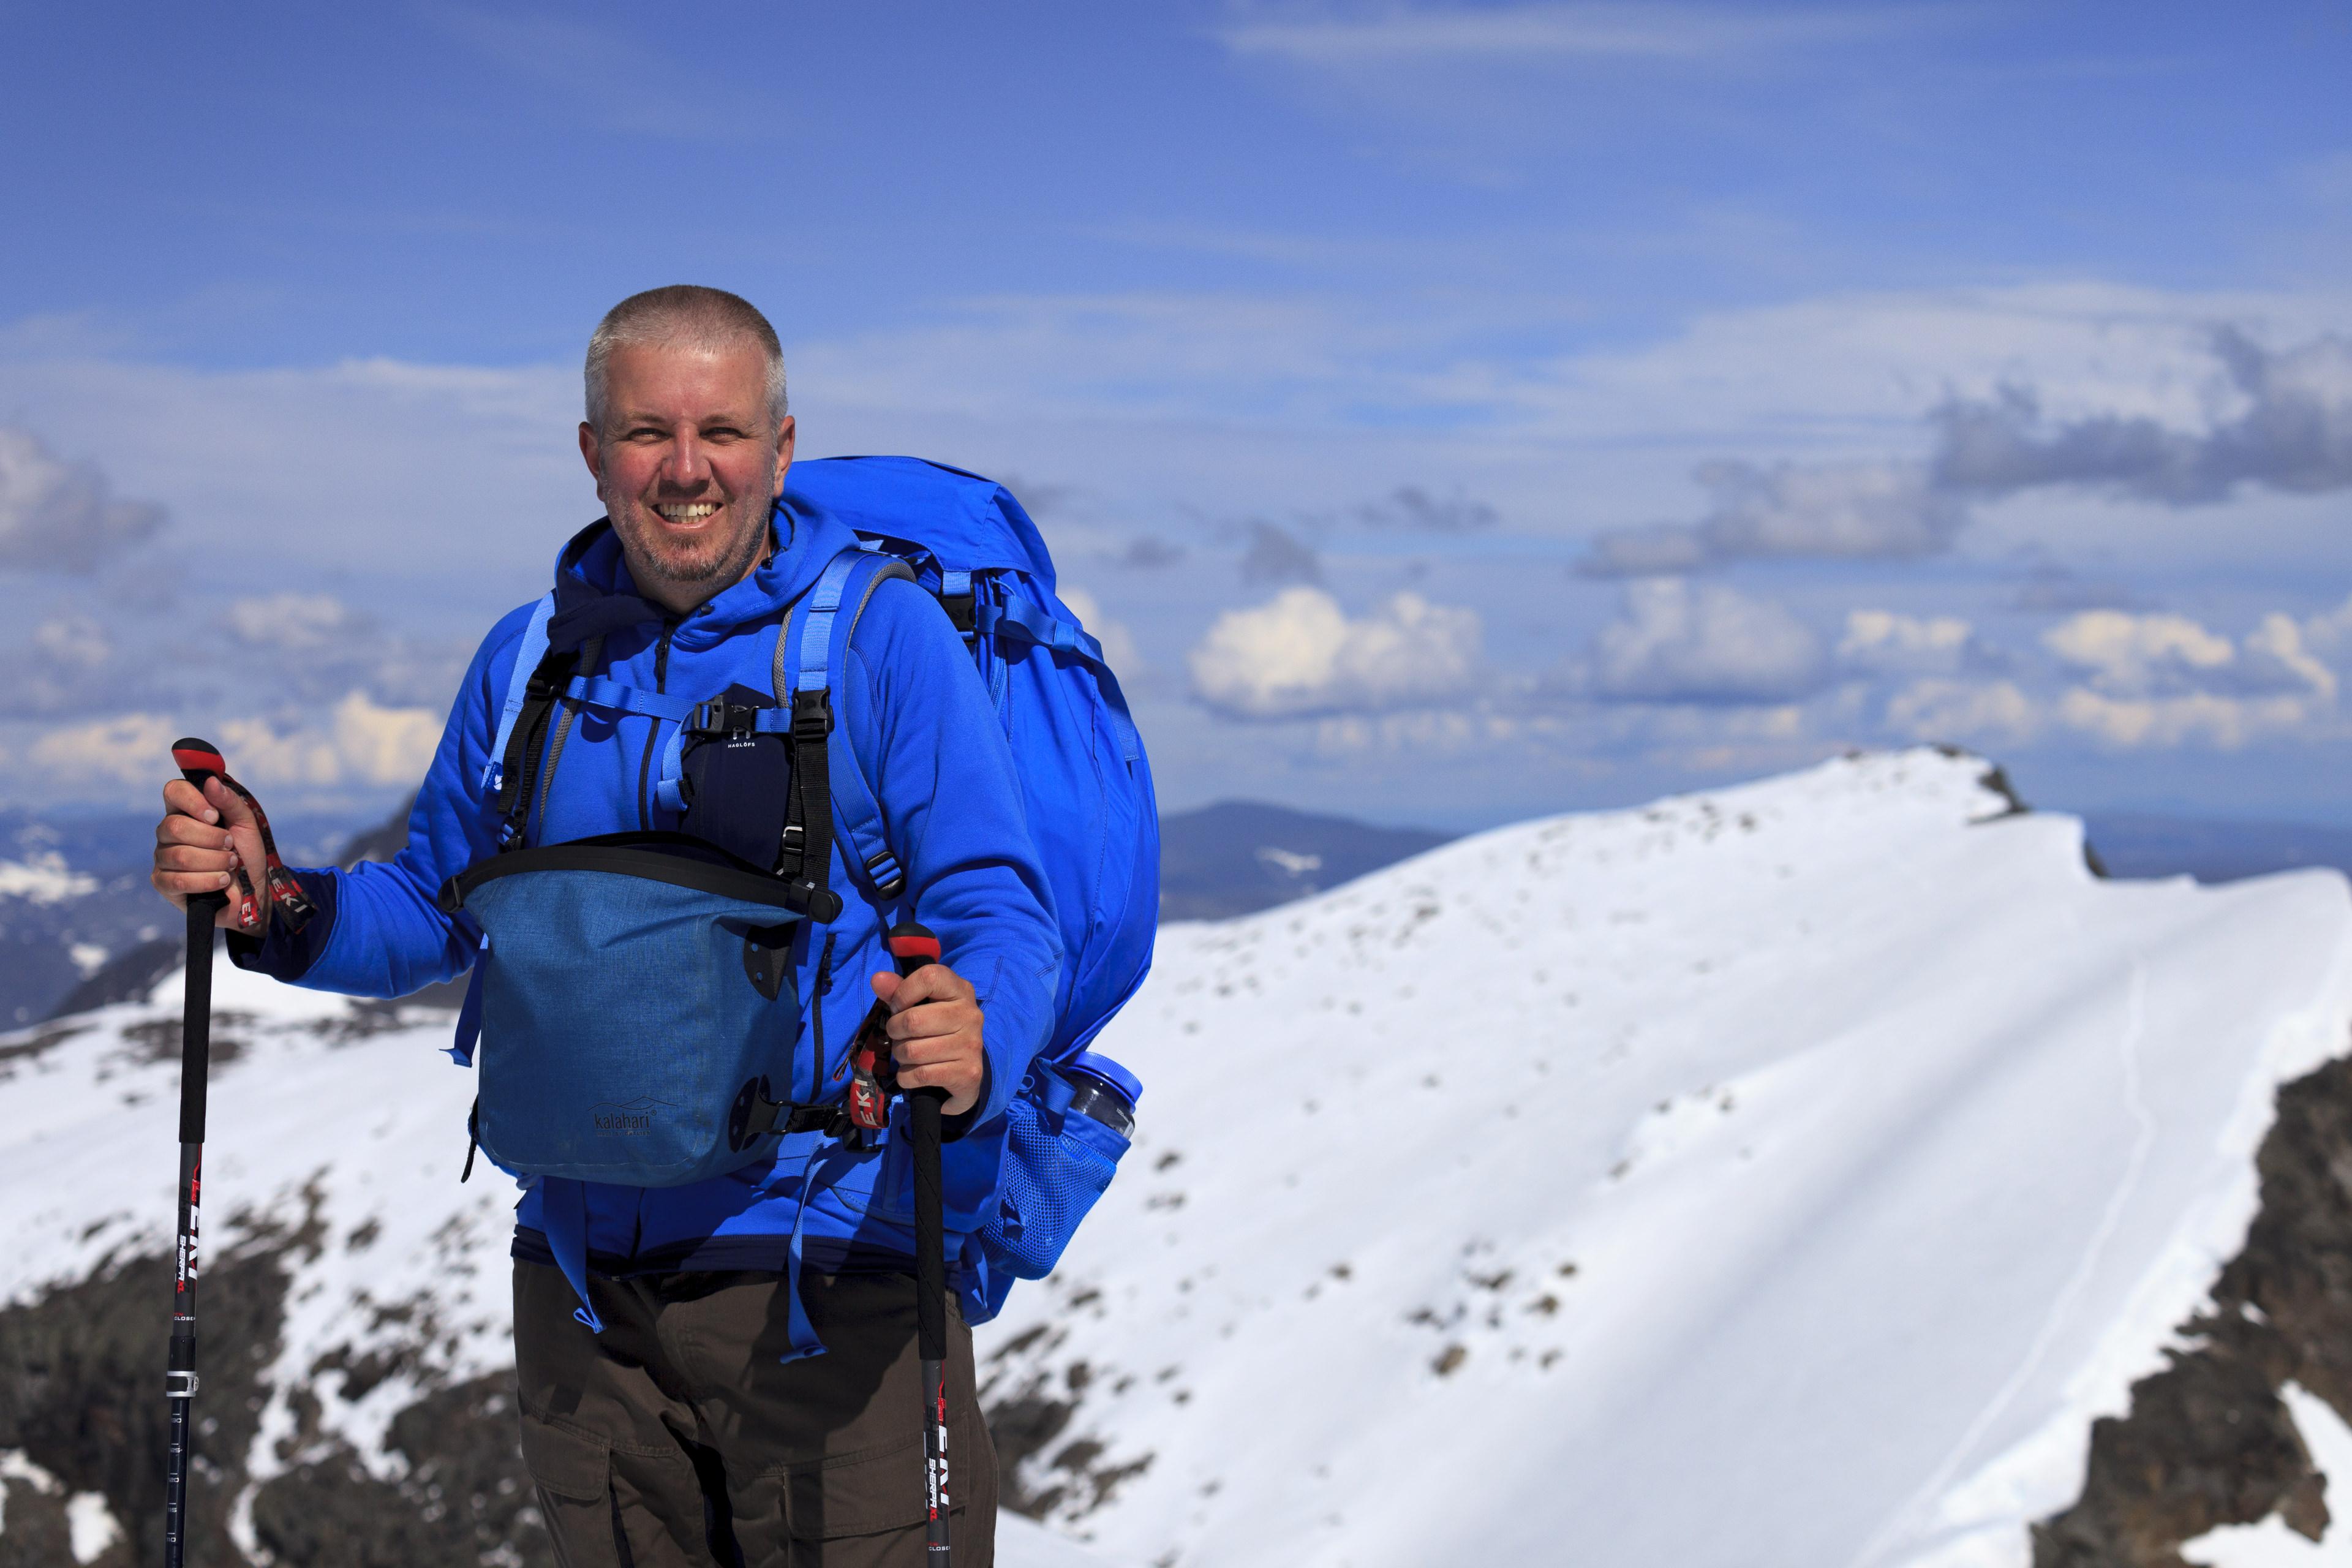 Markus am Kebnekaise Sydtoppen (2102m), im Hintergrund der Nordtoppen (2096m),©Markus Proske—Canon EOS 5D Mark II, EF70-300mm f/4-5.6L IS USM, 70mm, 1/1600s, Blende 5.6, ISO 200